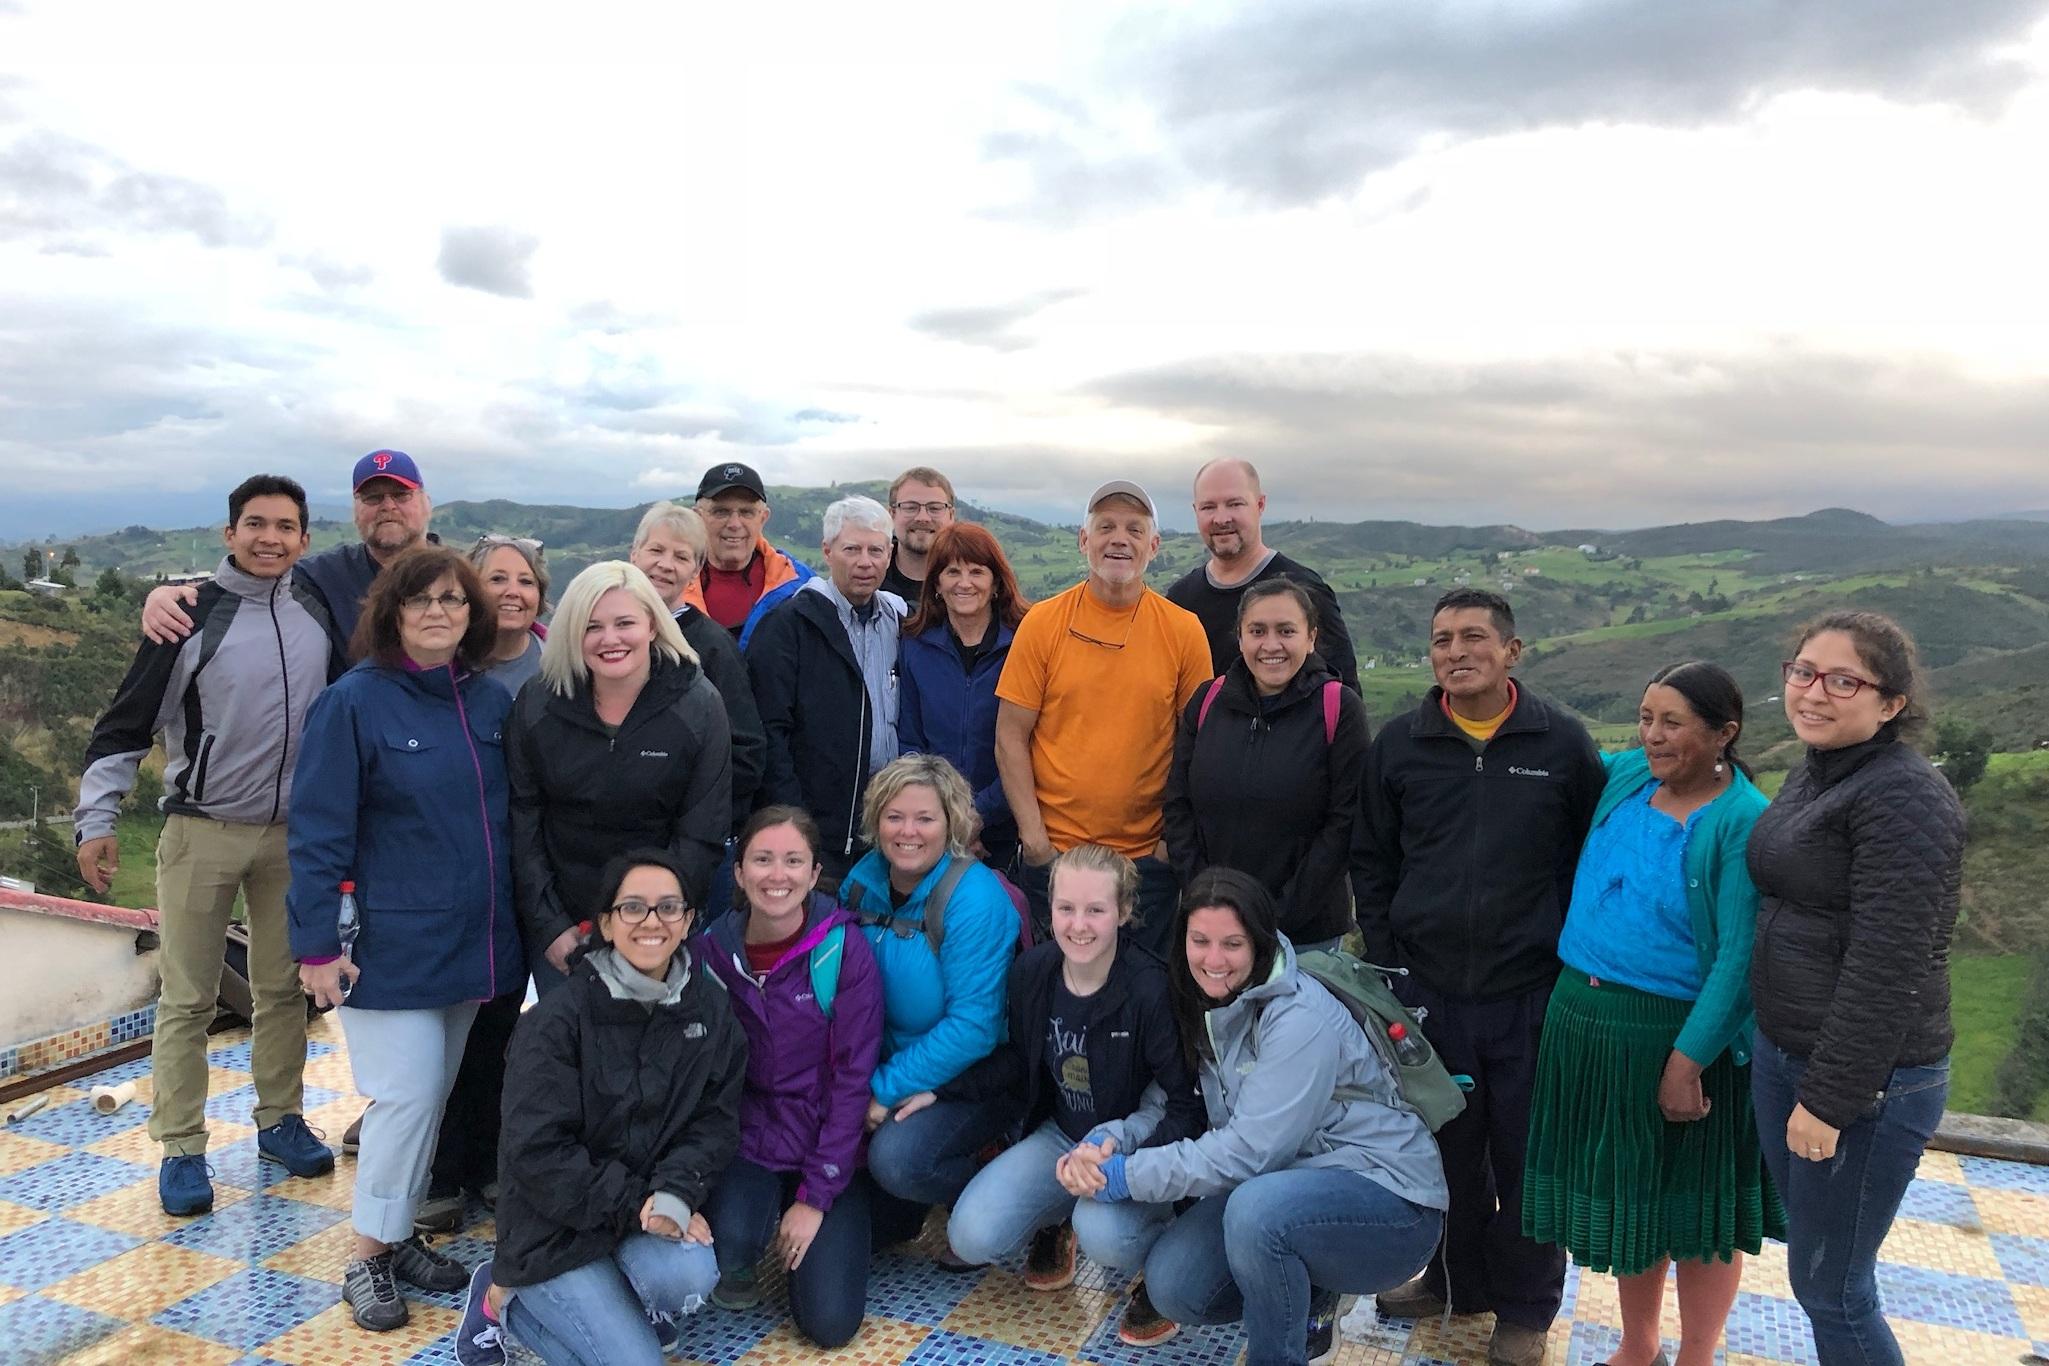 ECUADOR - Catch Up with the Pate family in Ecuador